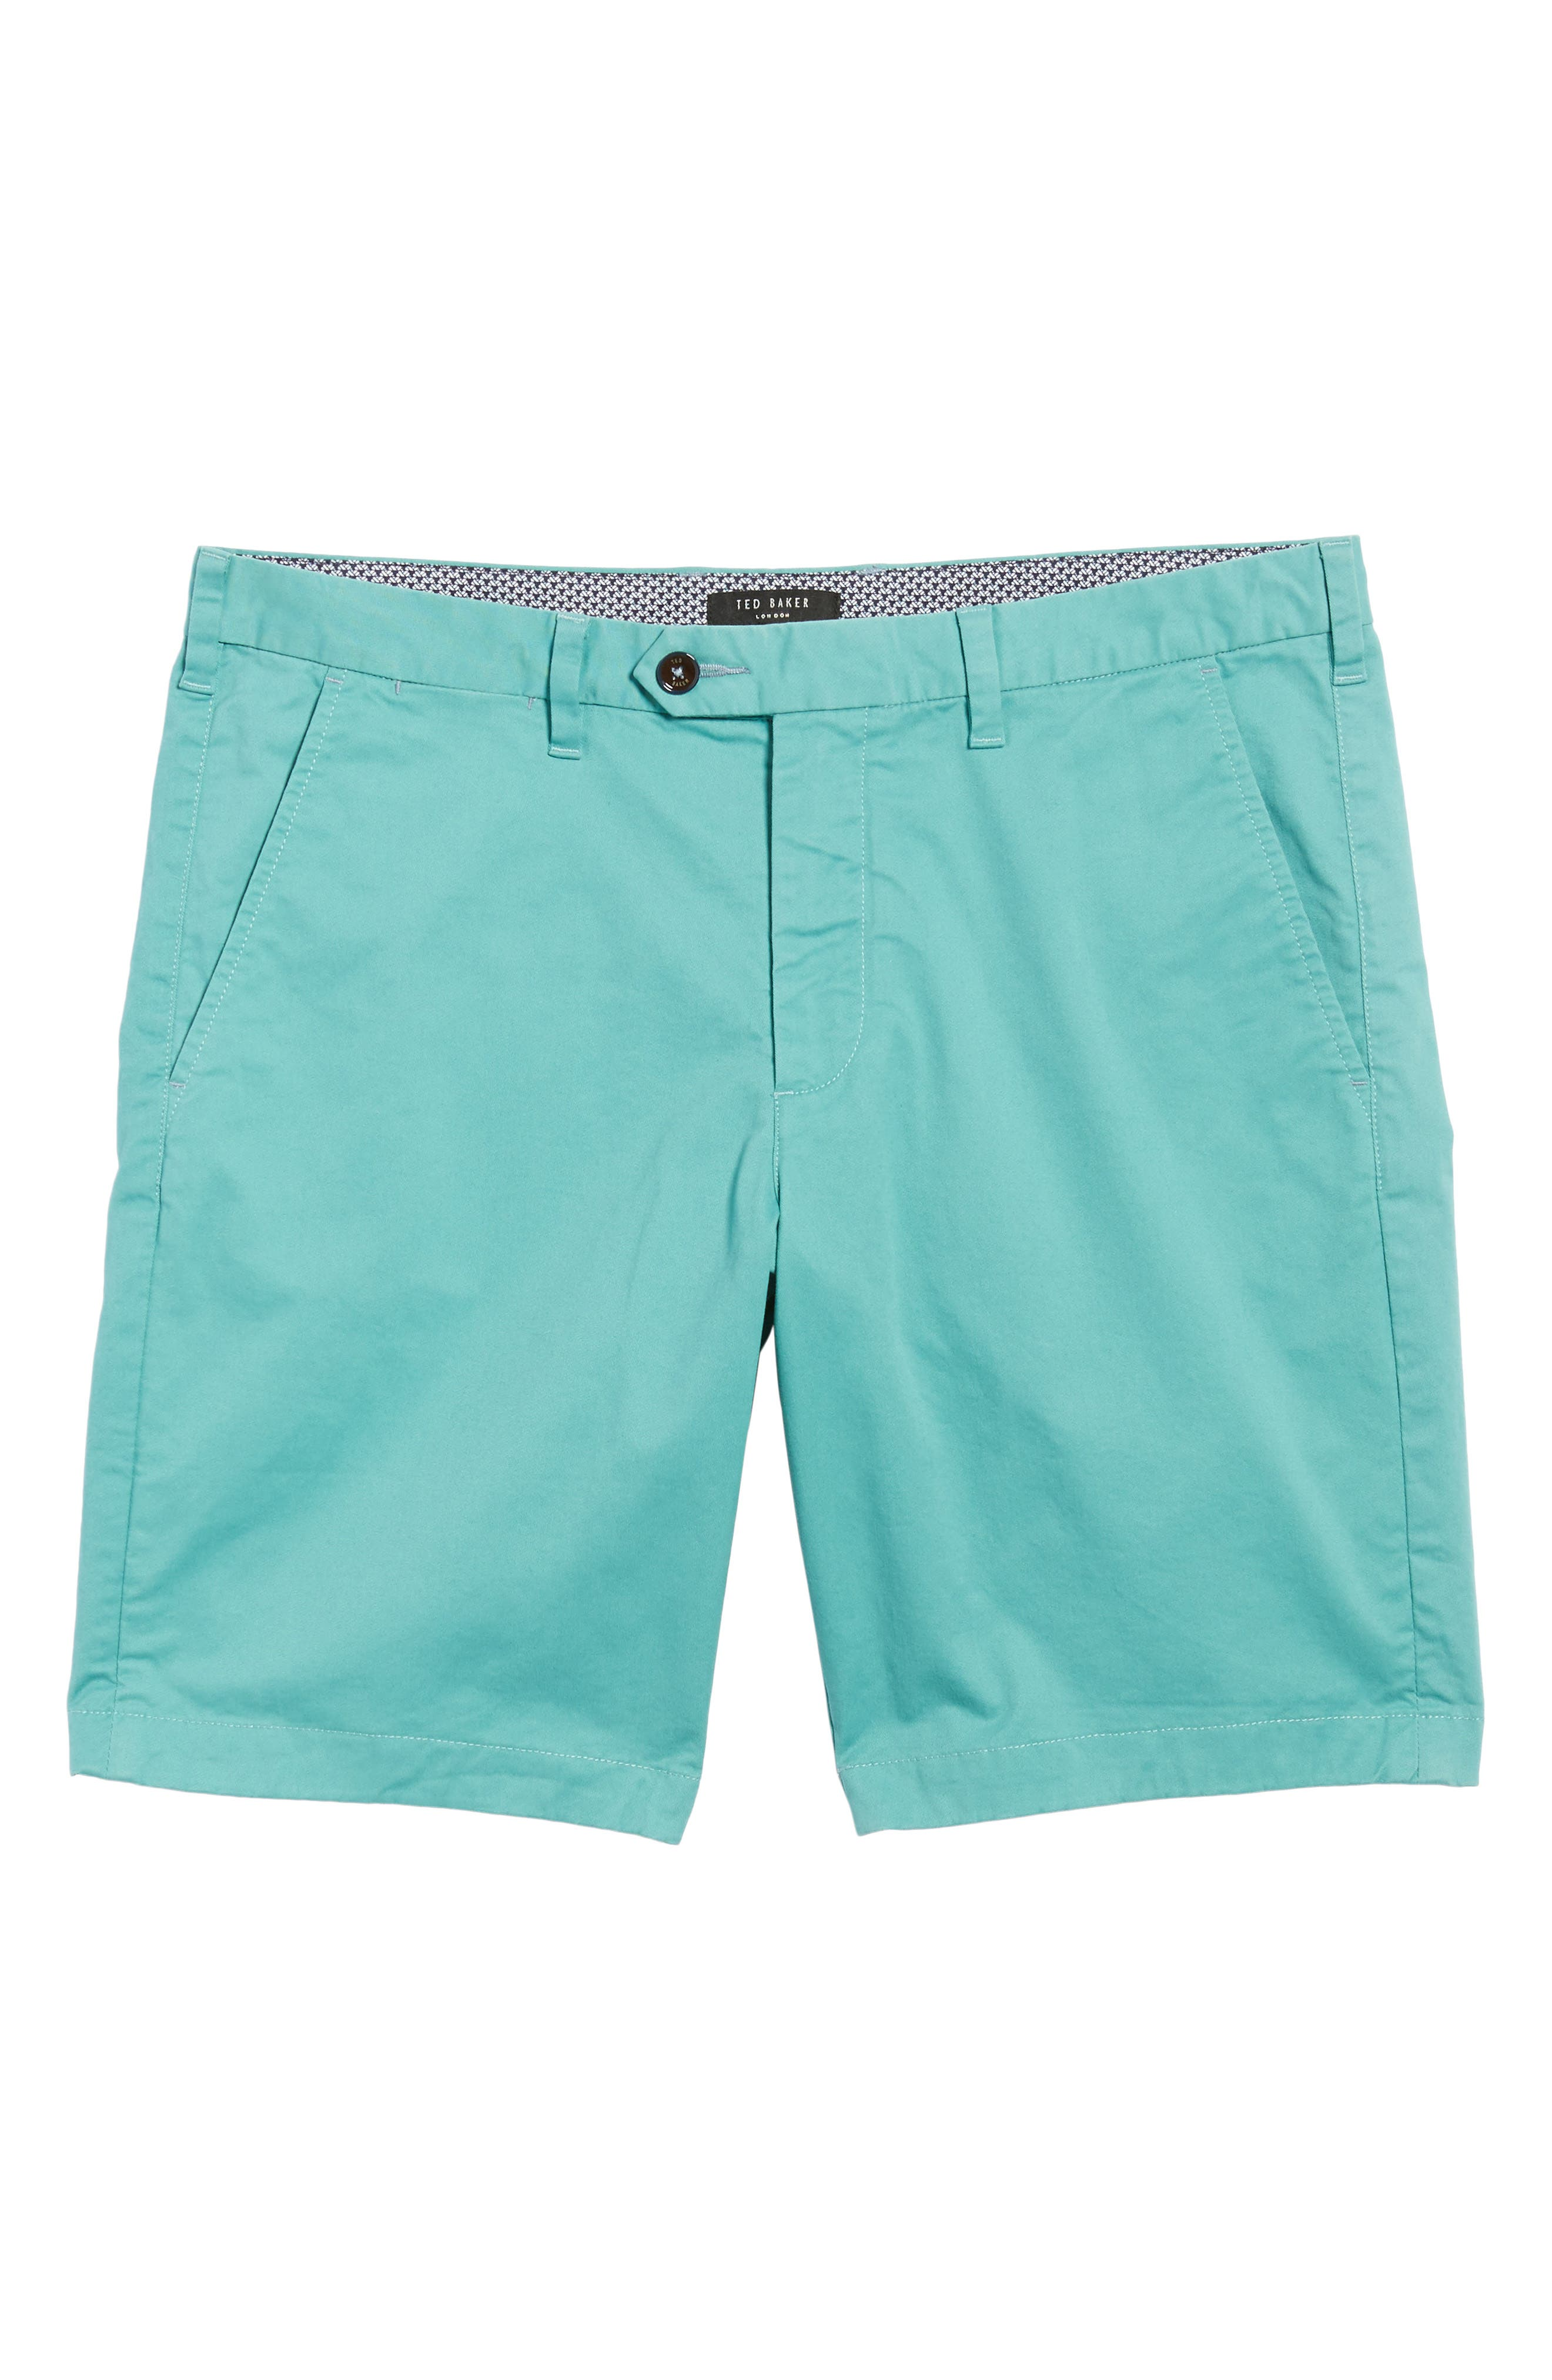 Proshtt Stretch Cotton Shorts,                             Alternate thumbnail 6, color,                             339